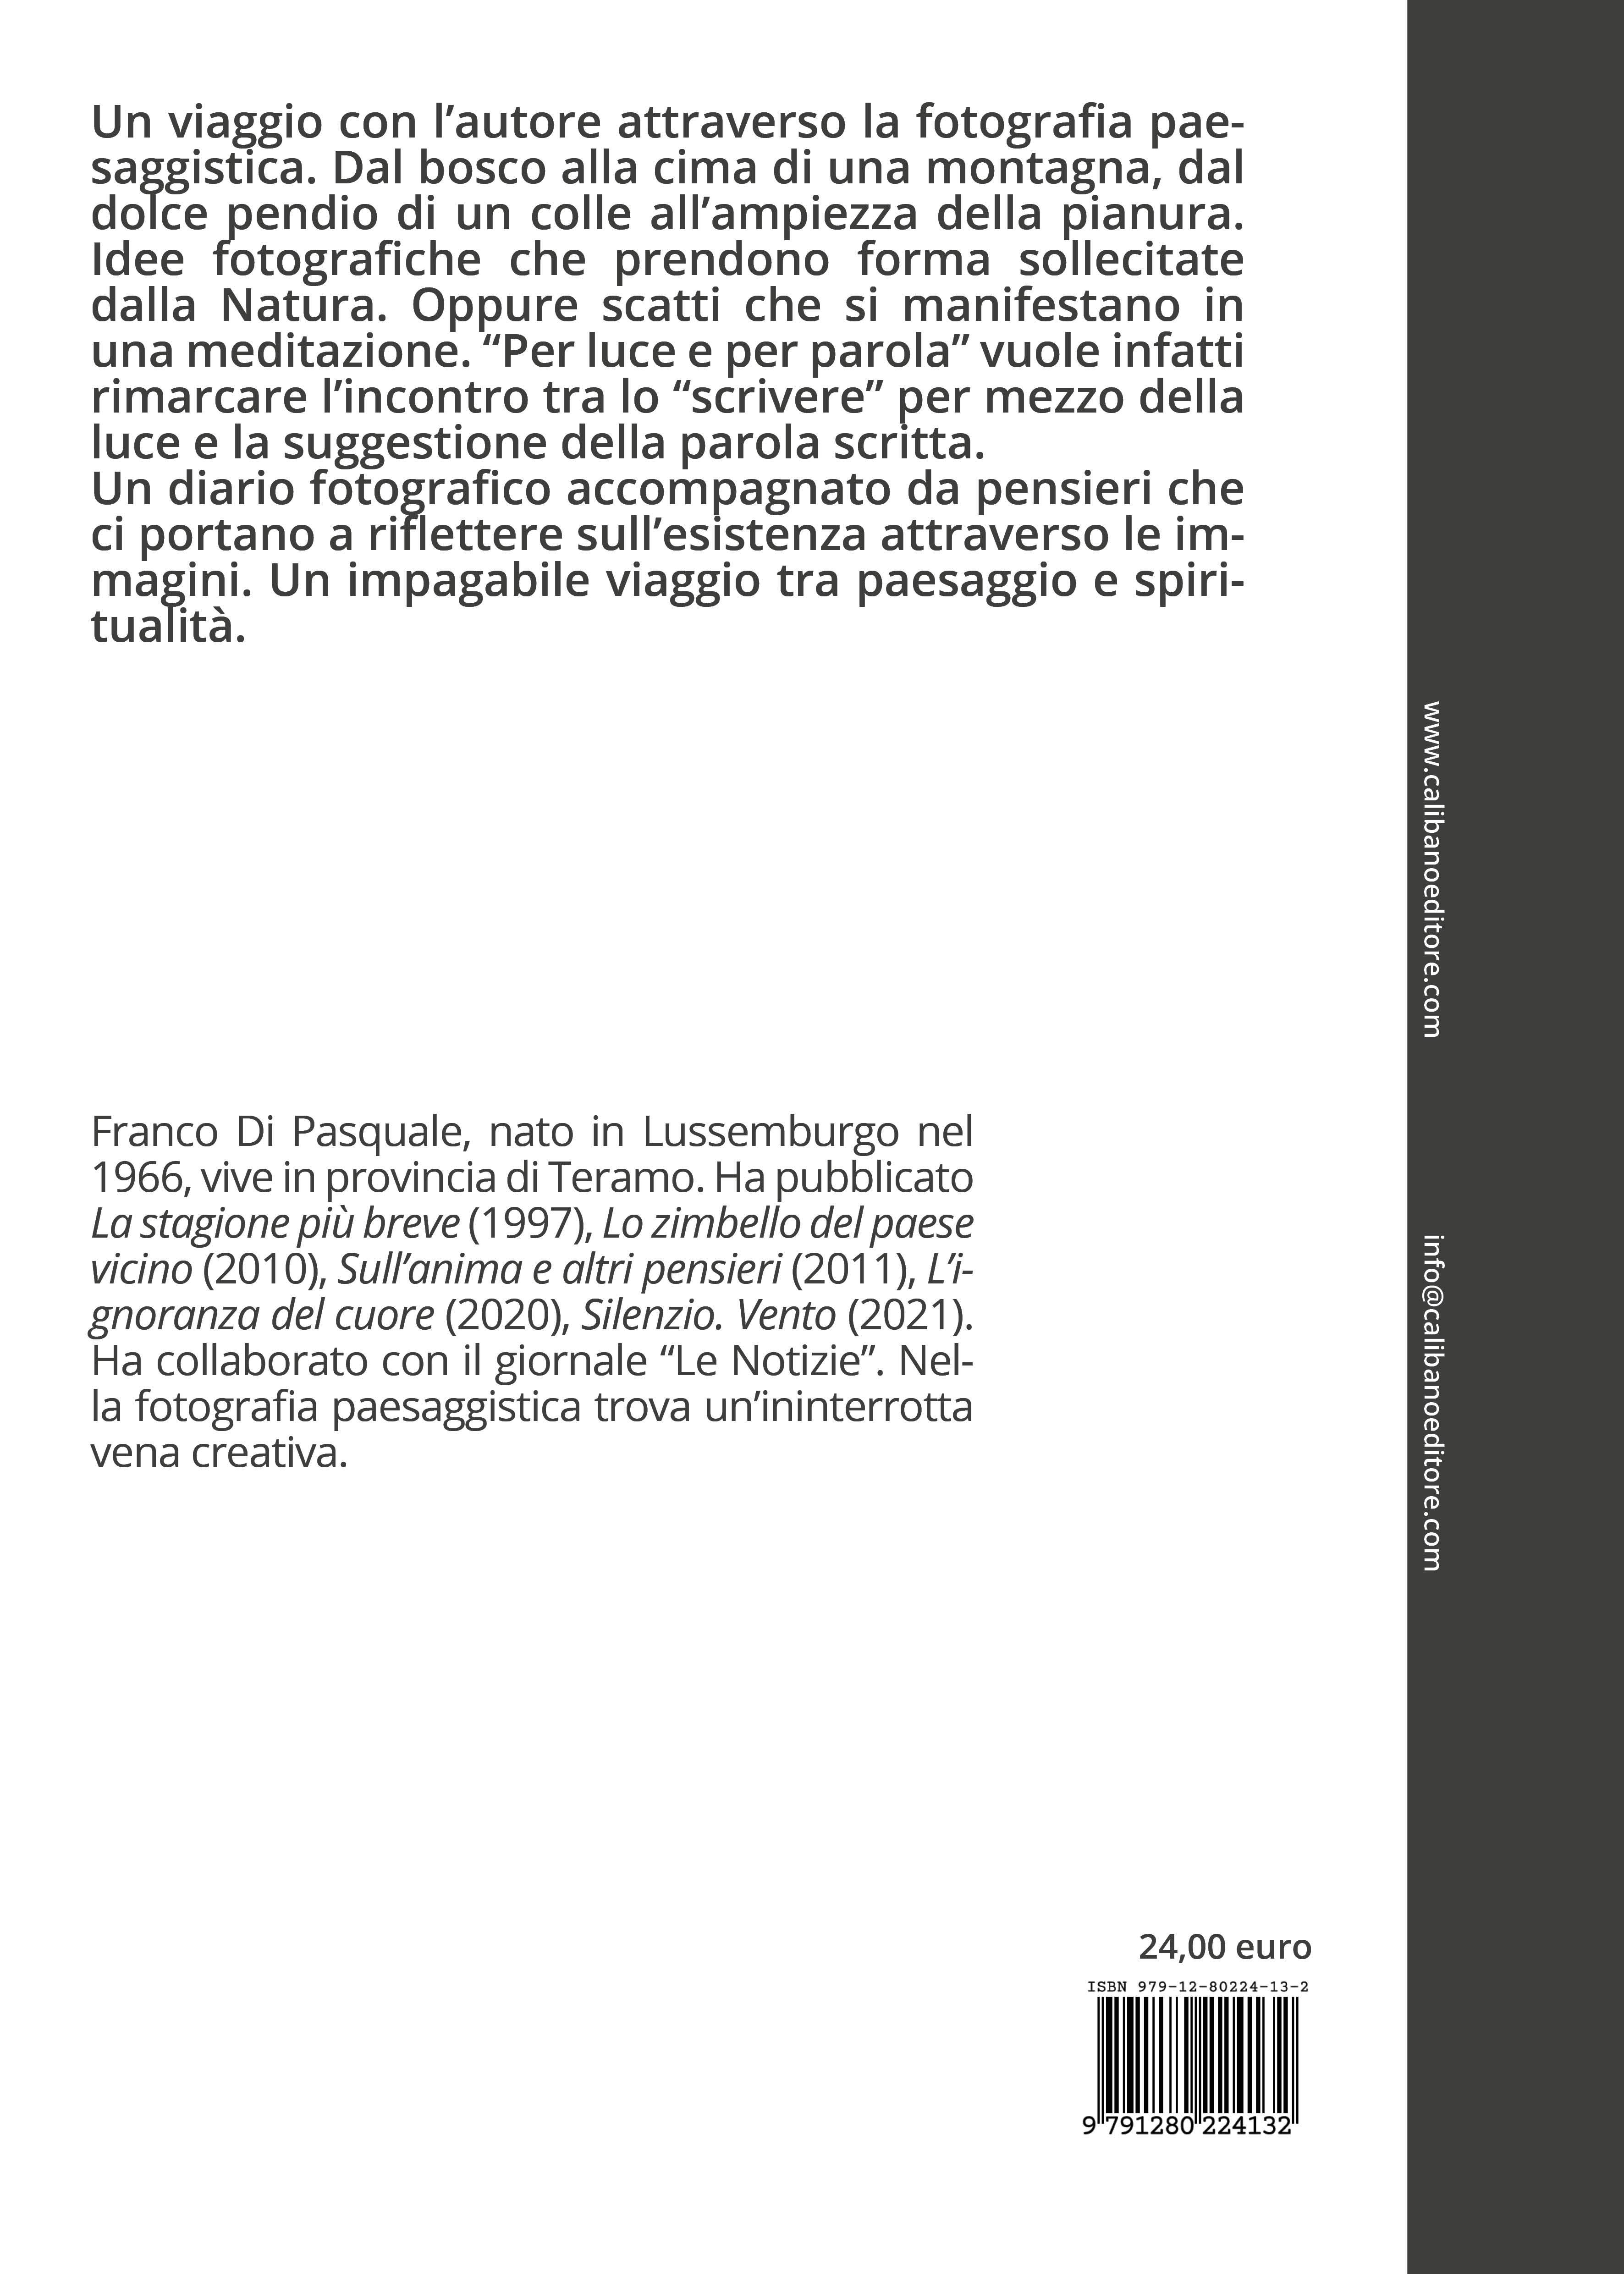 Meditazioni per luce e per parola-image-2%>